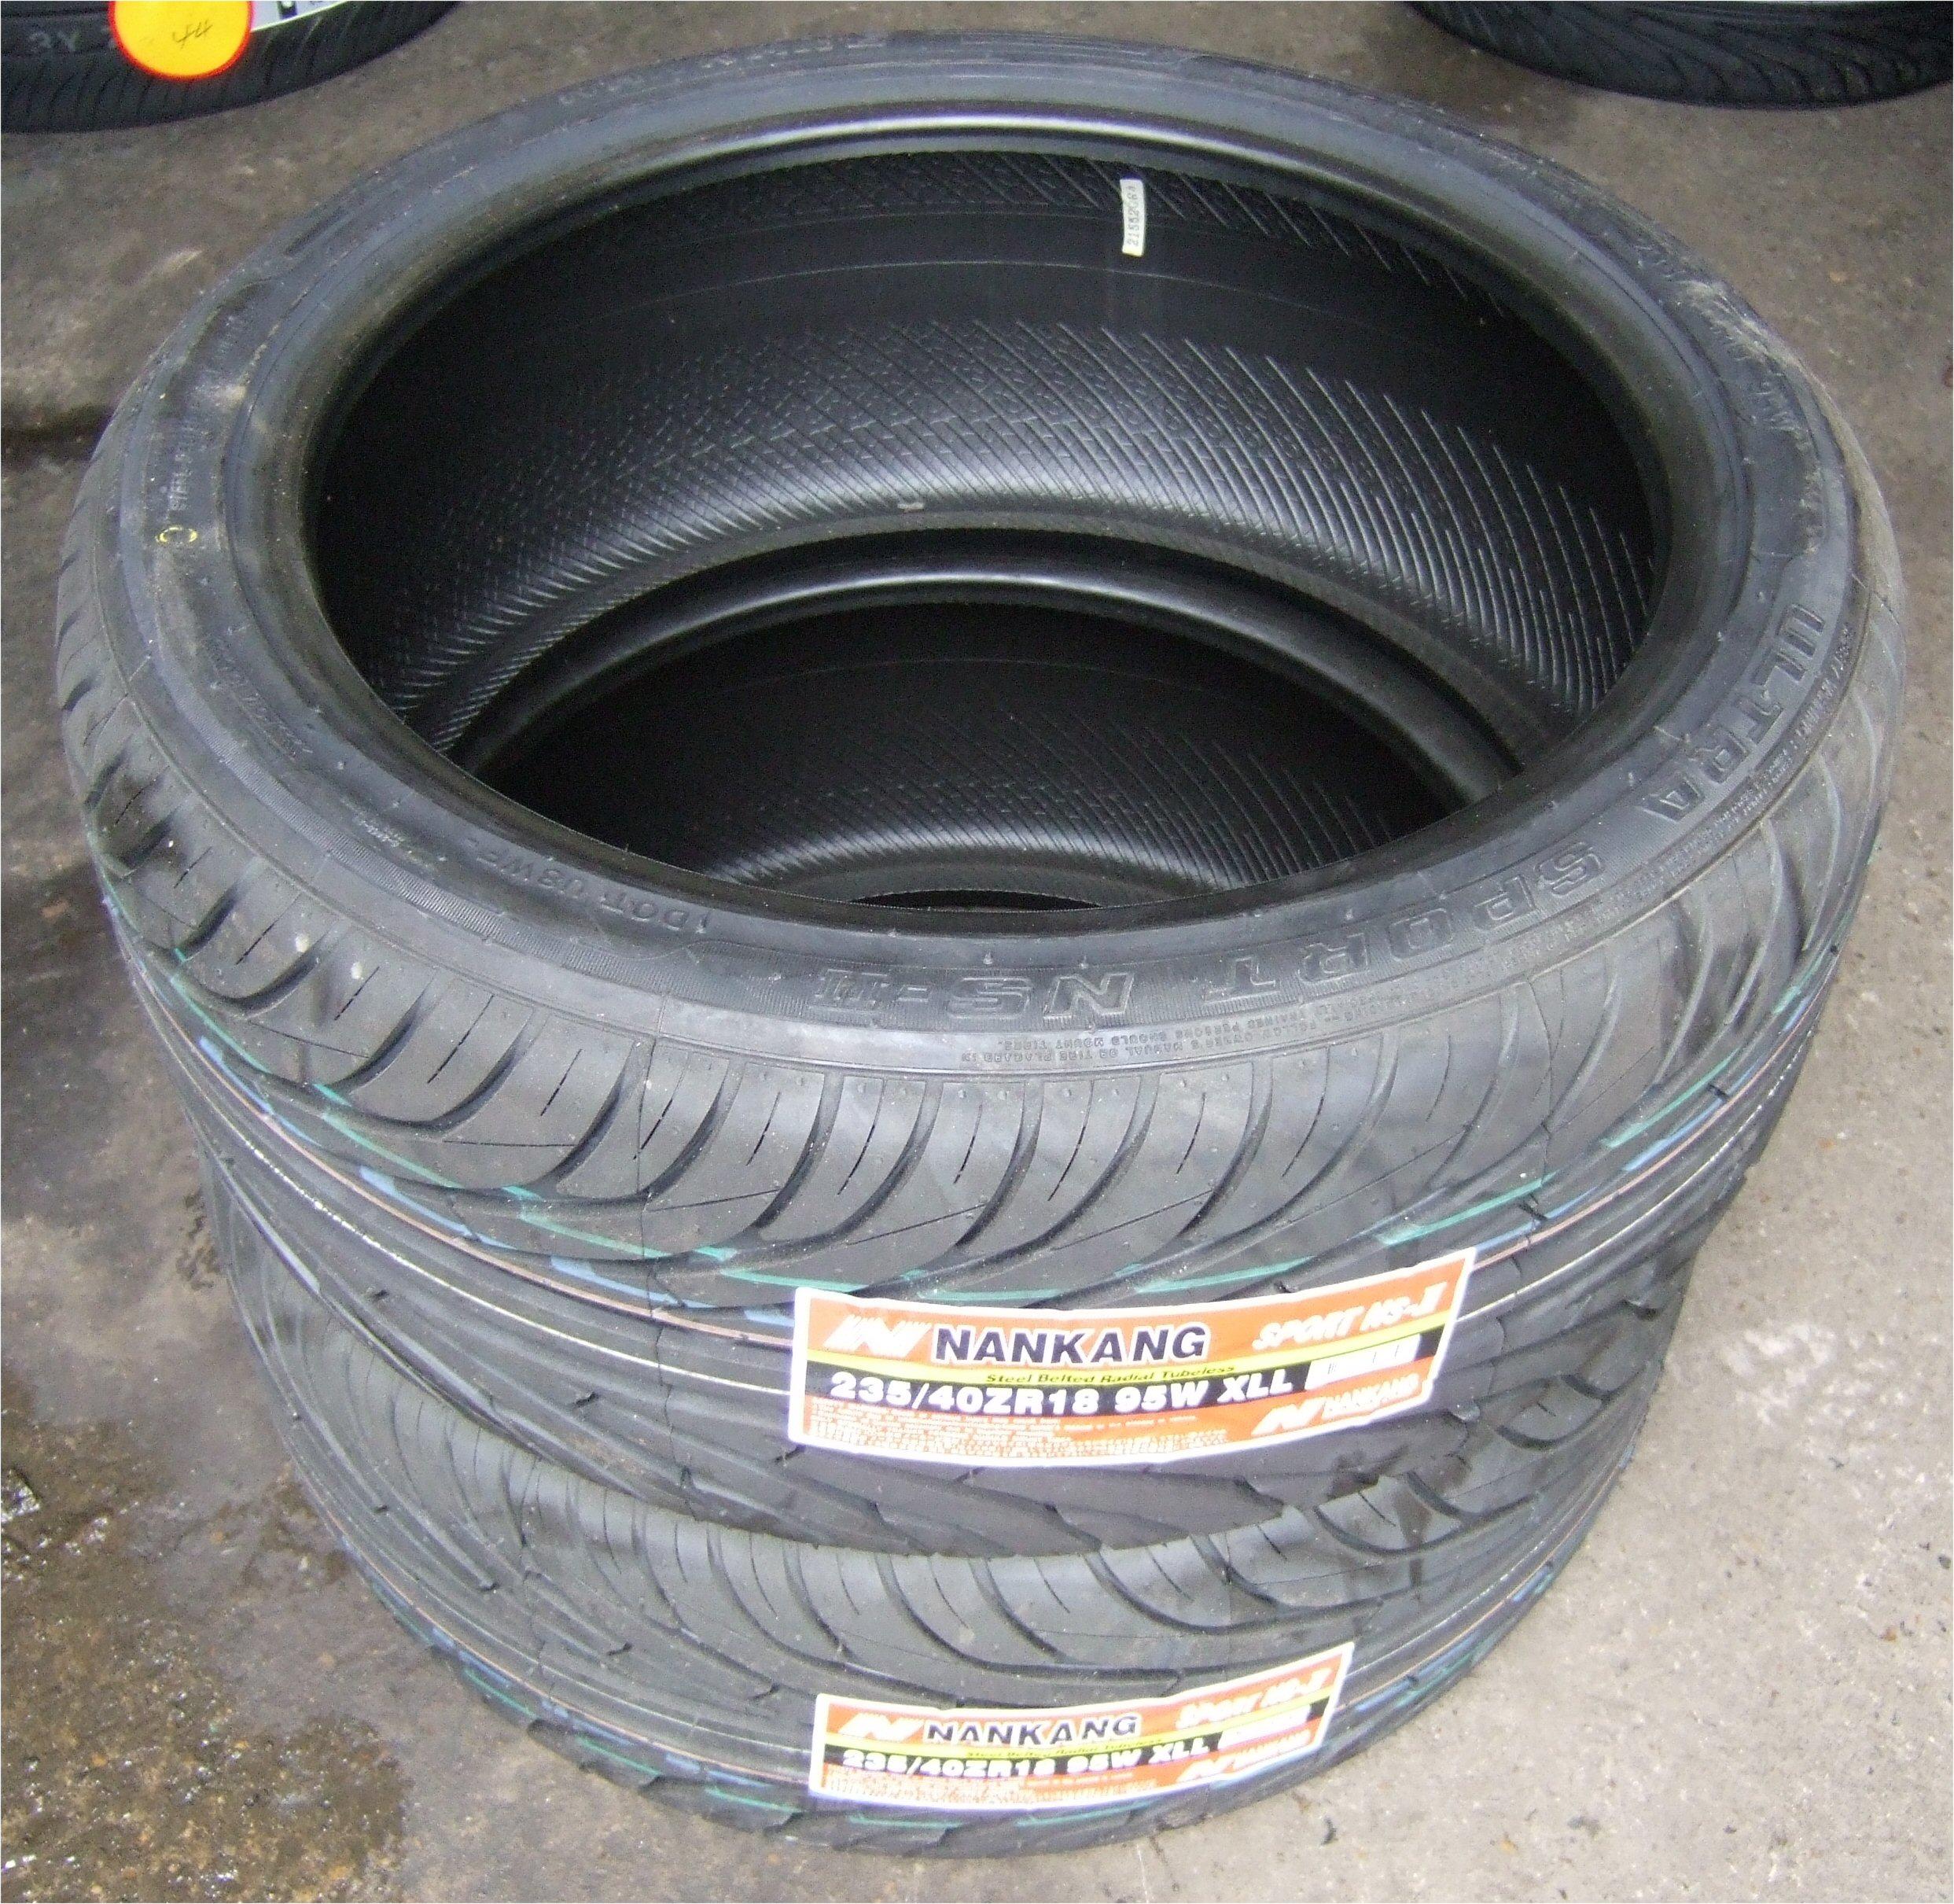 235 40 18 nankang ns2 budget tyres 2354018 98w 235 40. Black Bedroom Furniture Sets. Home Design Ideas